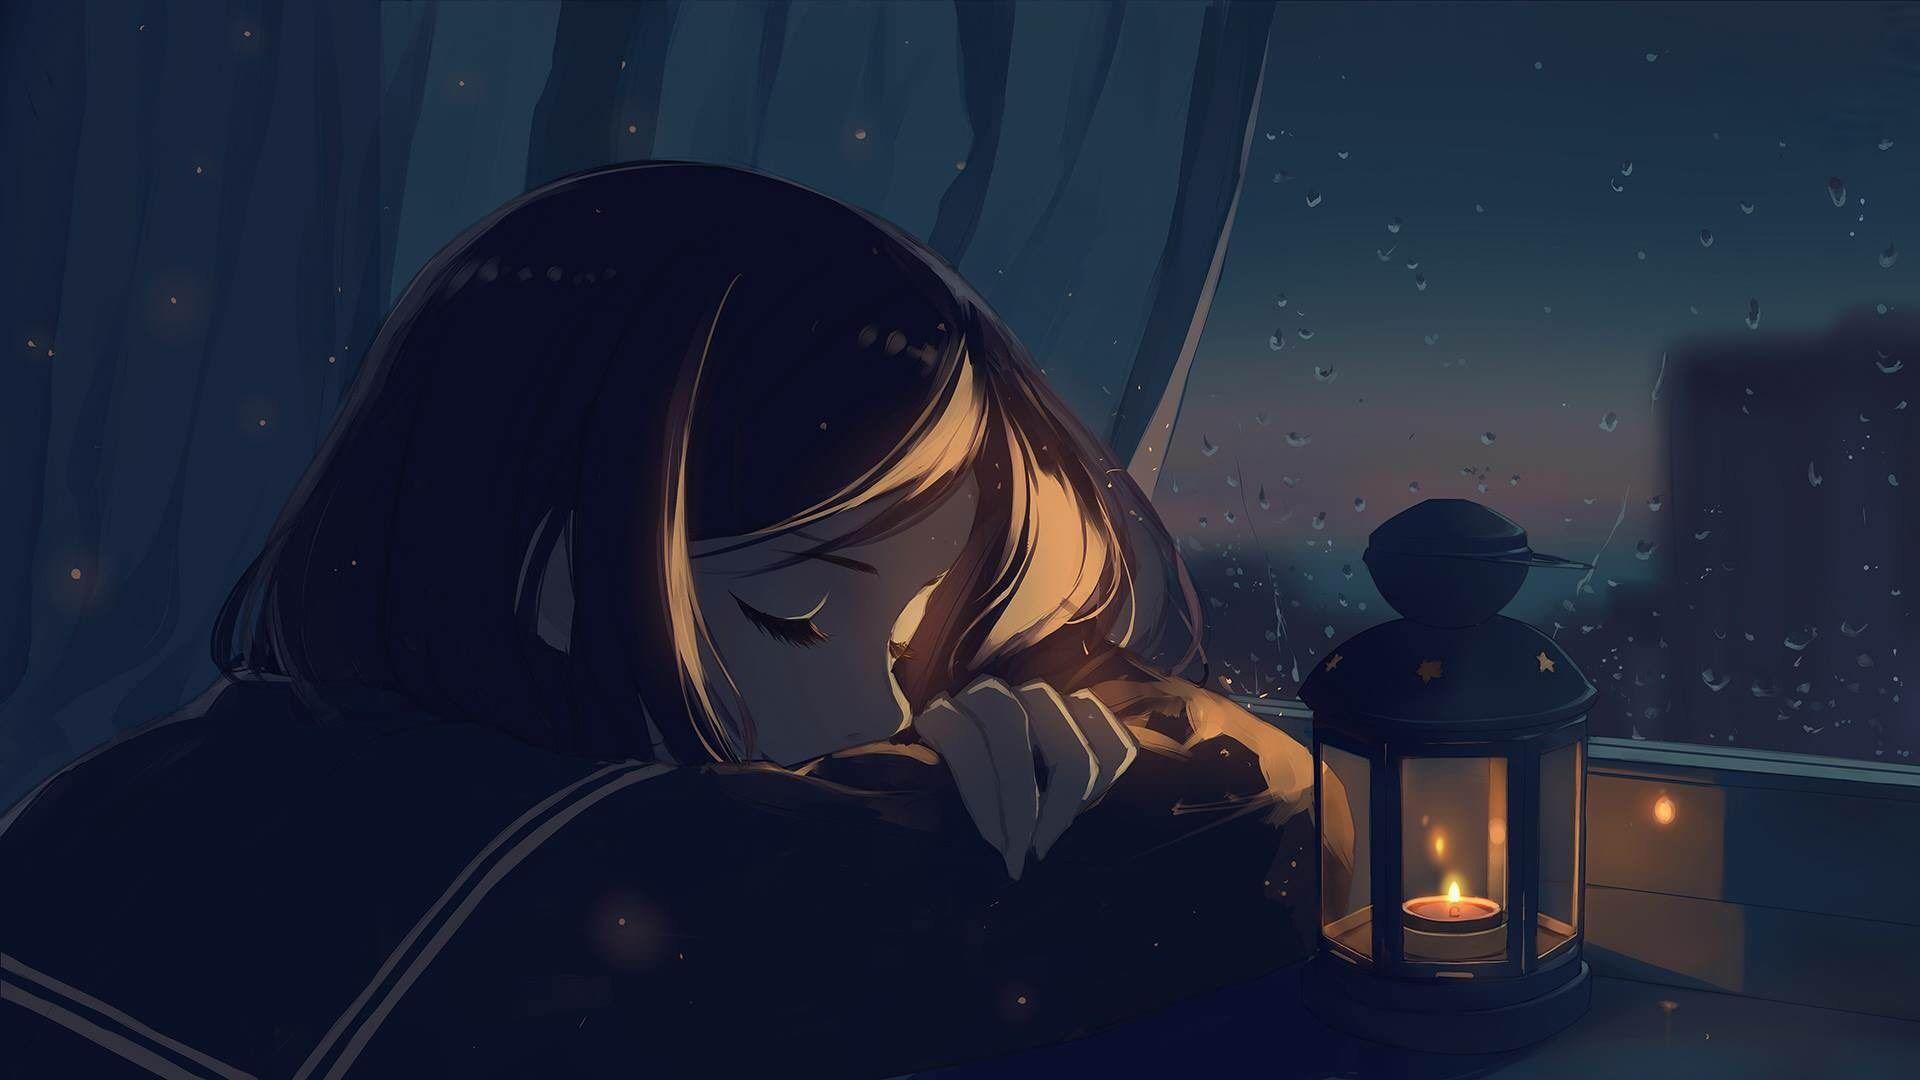 Falling Asleep Original Anime Art Beautiful Anime Scenery Lonely Art